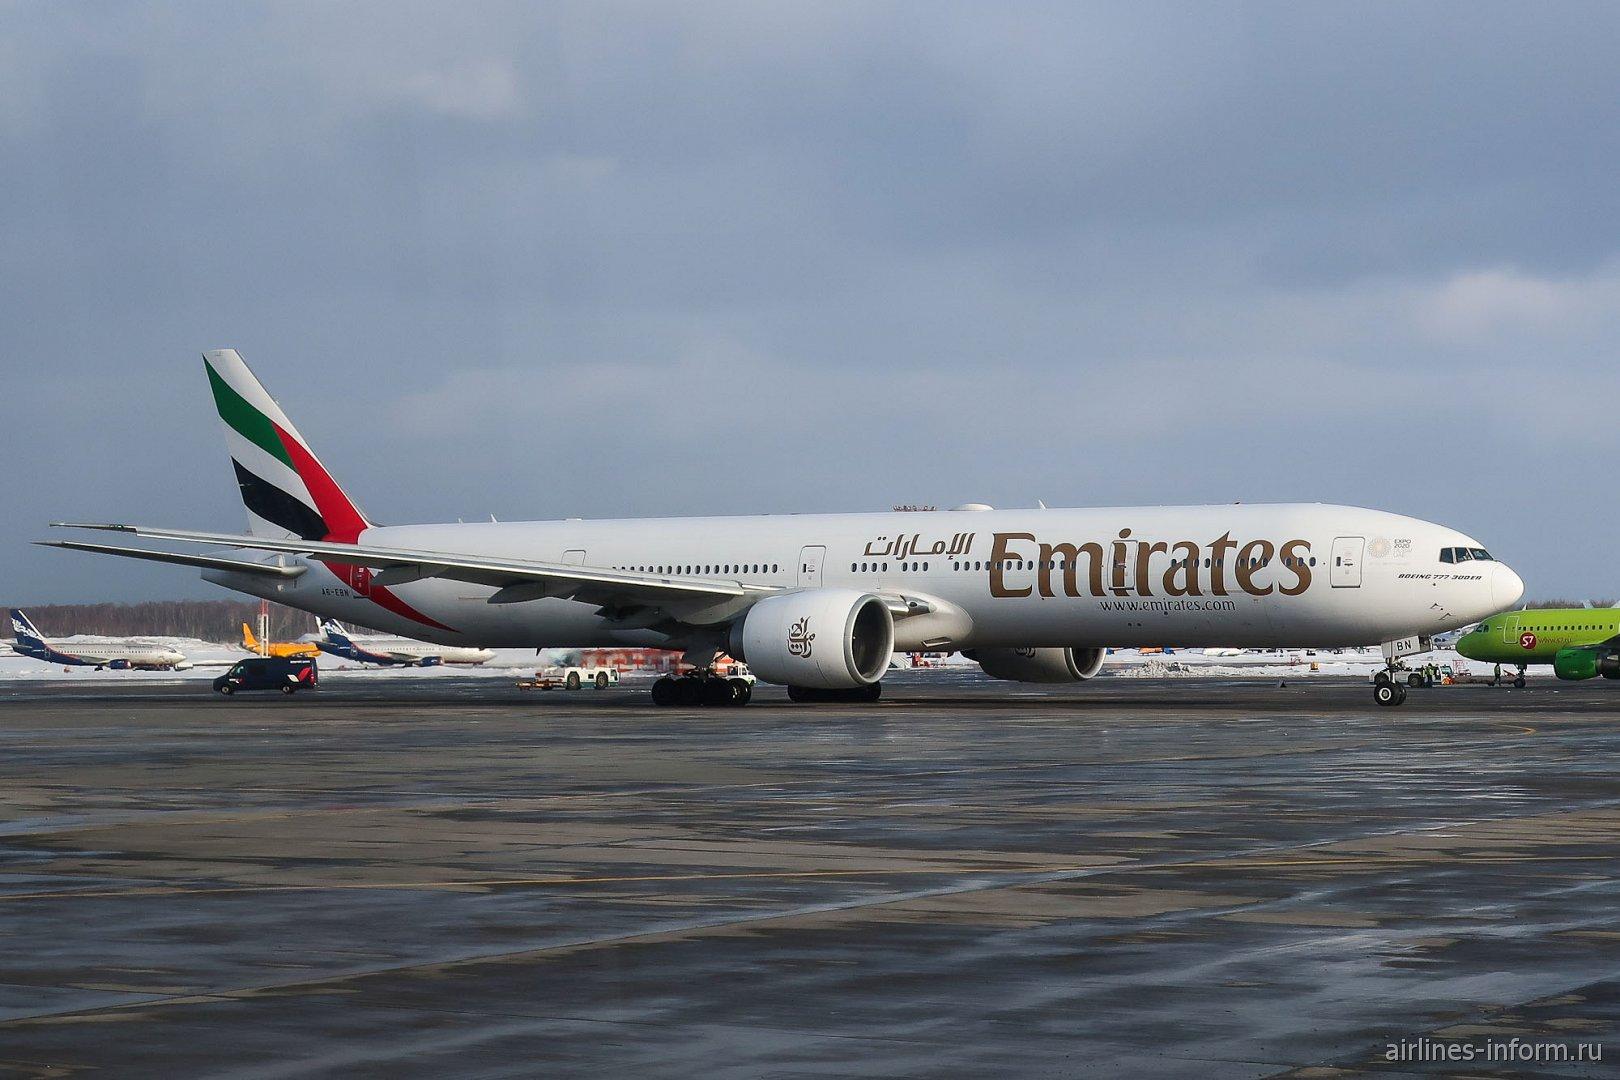 Боинг-777-300 авиакомпании Emirates в аэропорту Домодедово